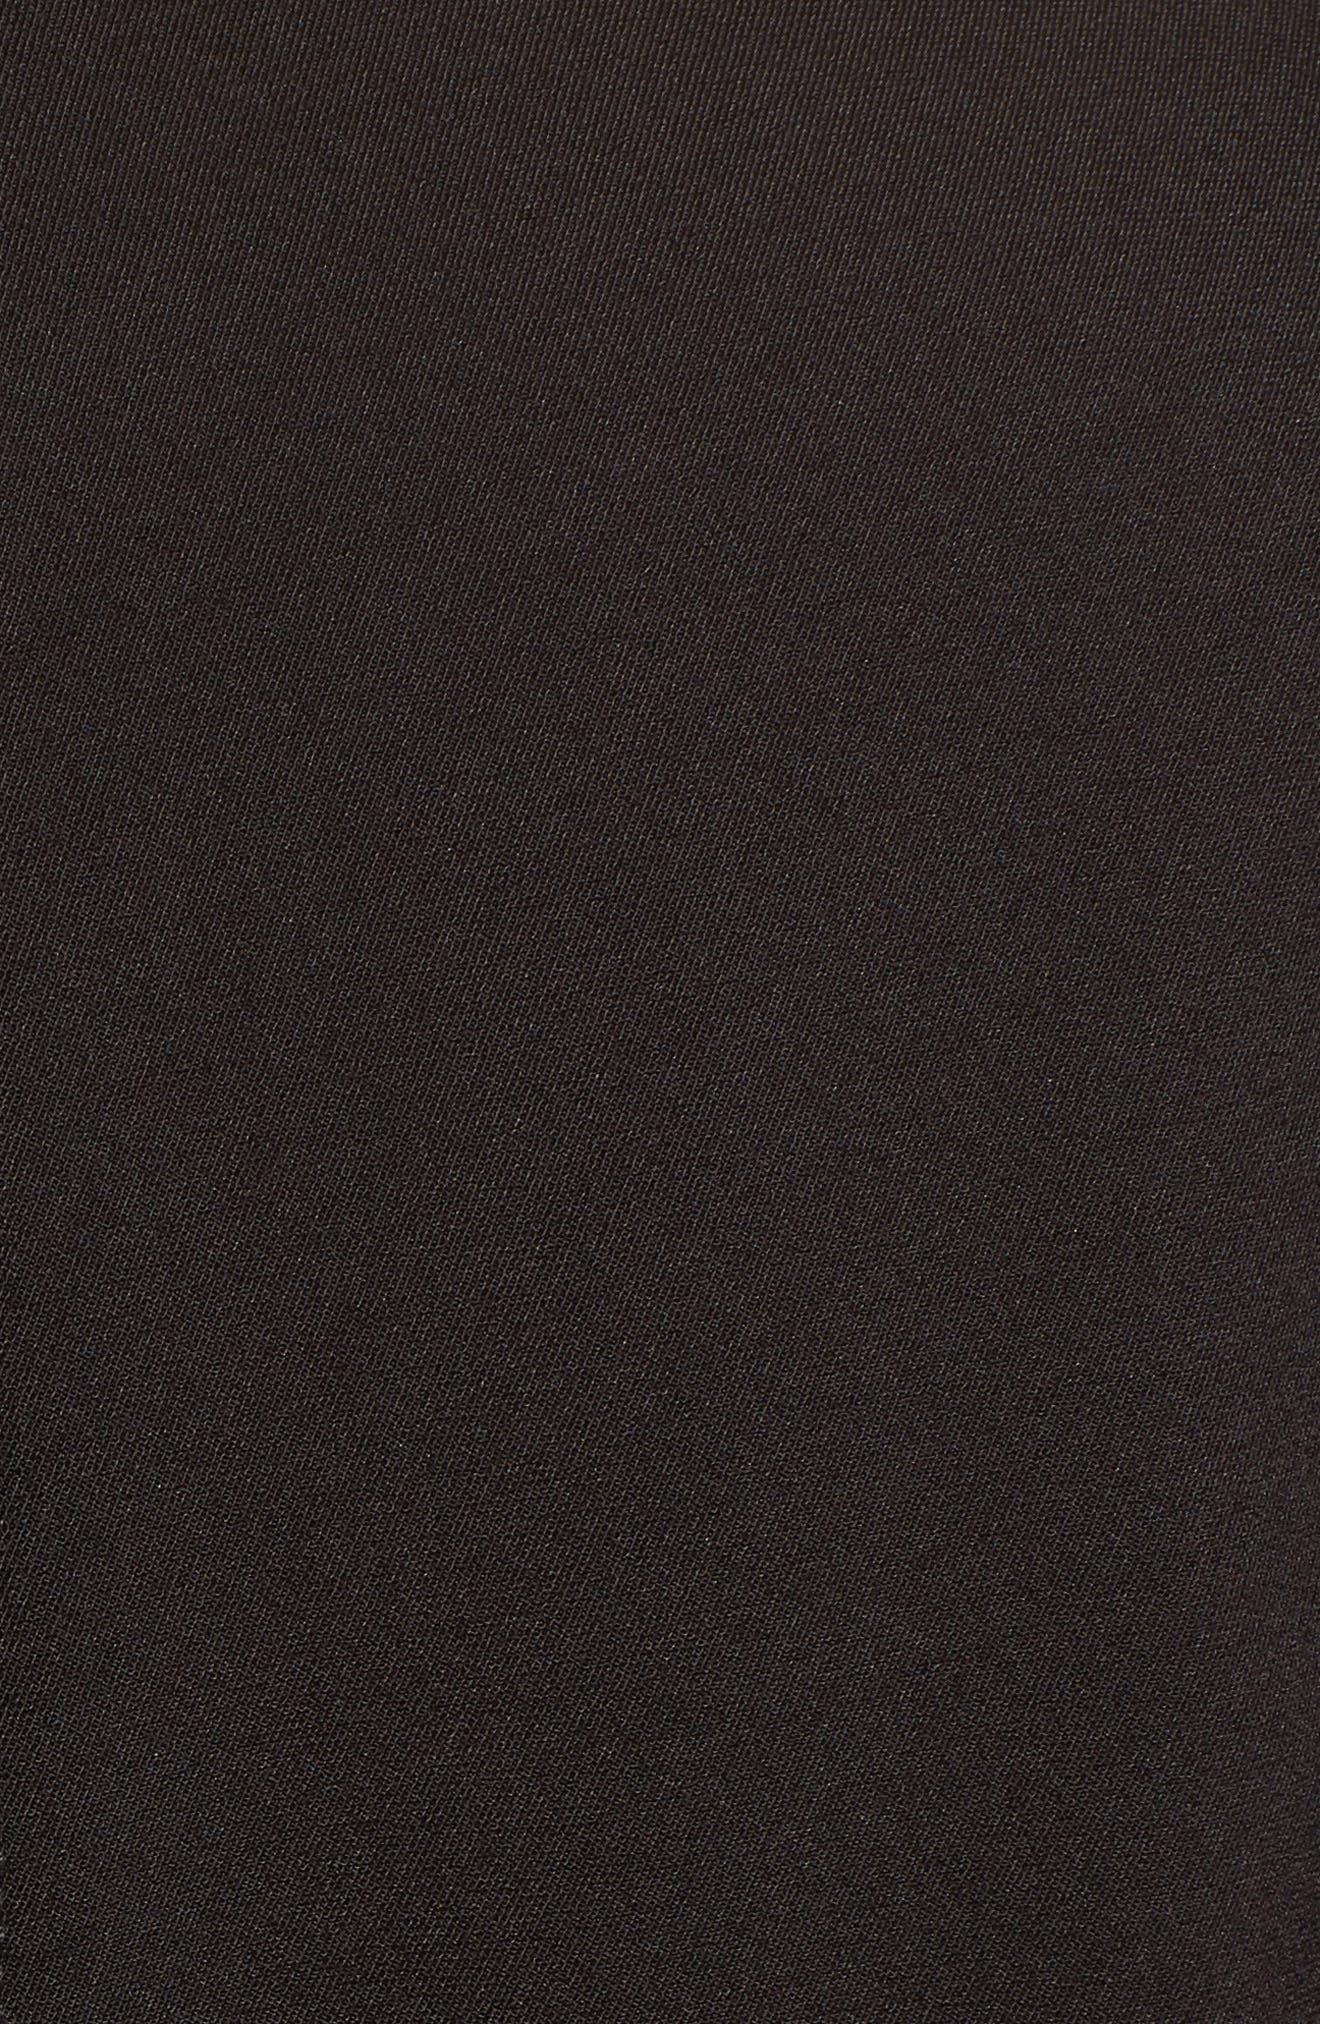 Abbey Draped Collar Wrap Coat,                             Alternate thumbnail 7, color,                             BLACK